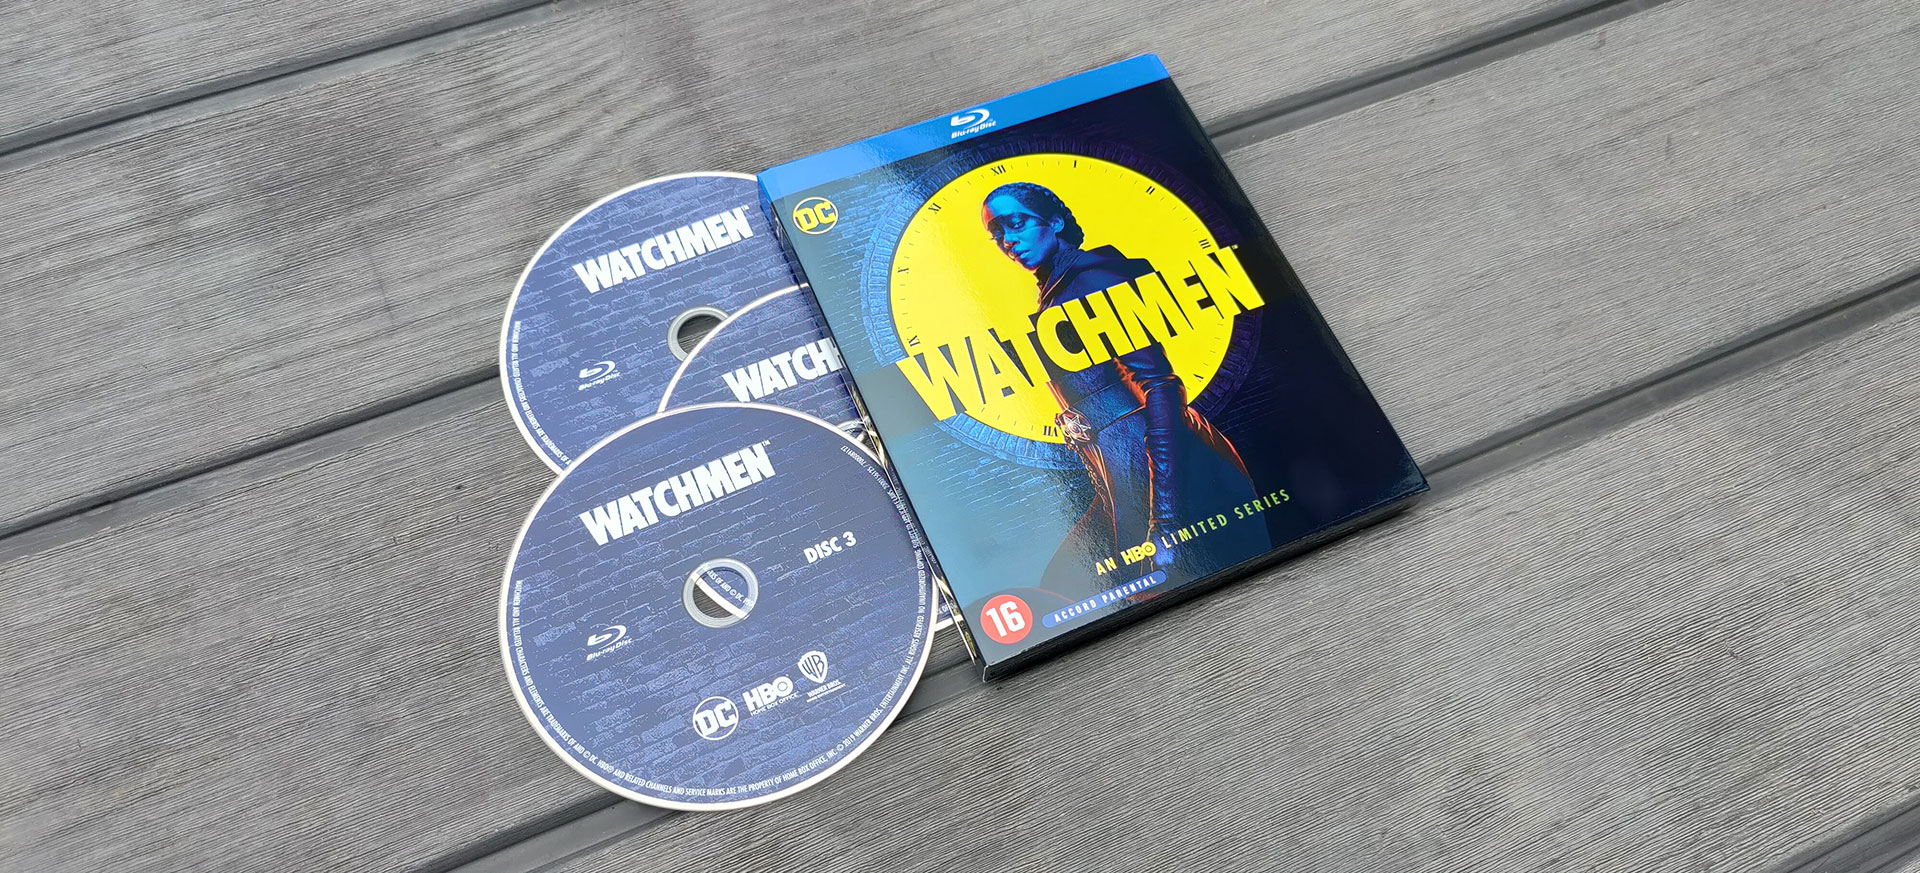 watchmen Seizoen 1 op Blu-Ray